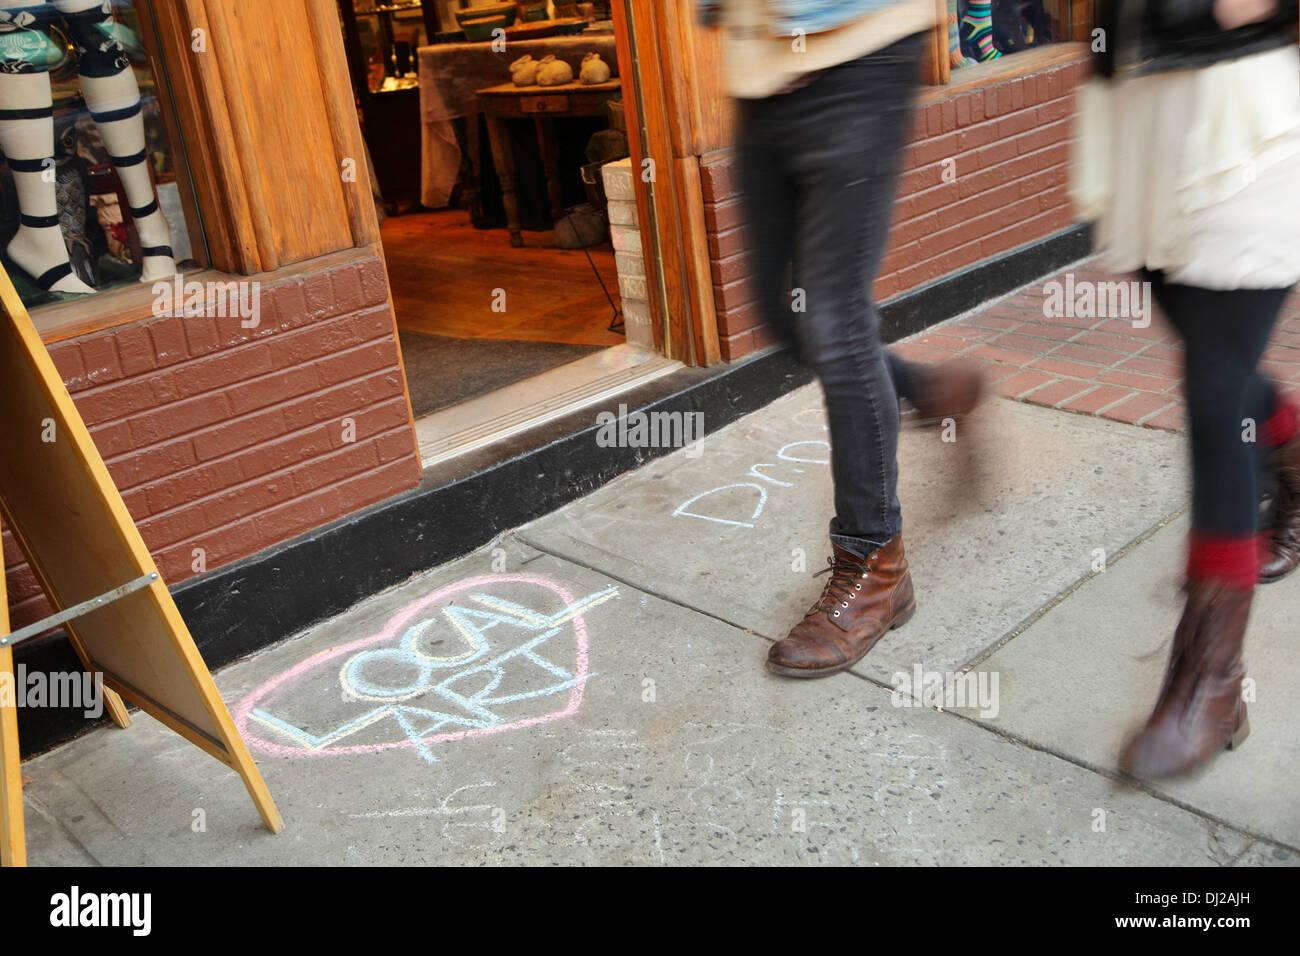 Pedestrians on Biltmore Avenue walk past a chalk drawing promoting local art, Asheville, North Carolina, USA - Stock Image